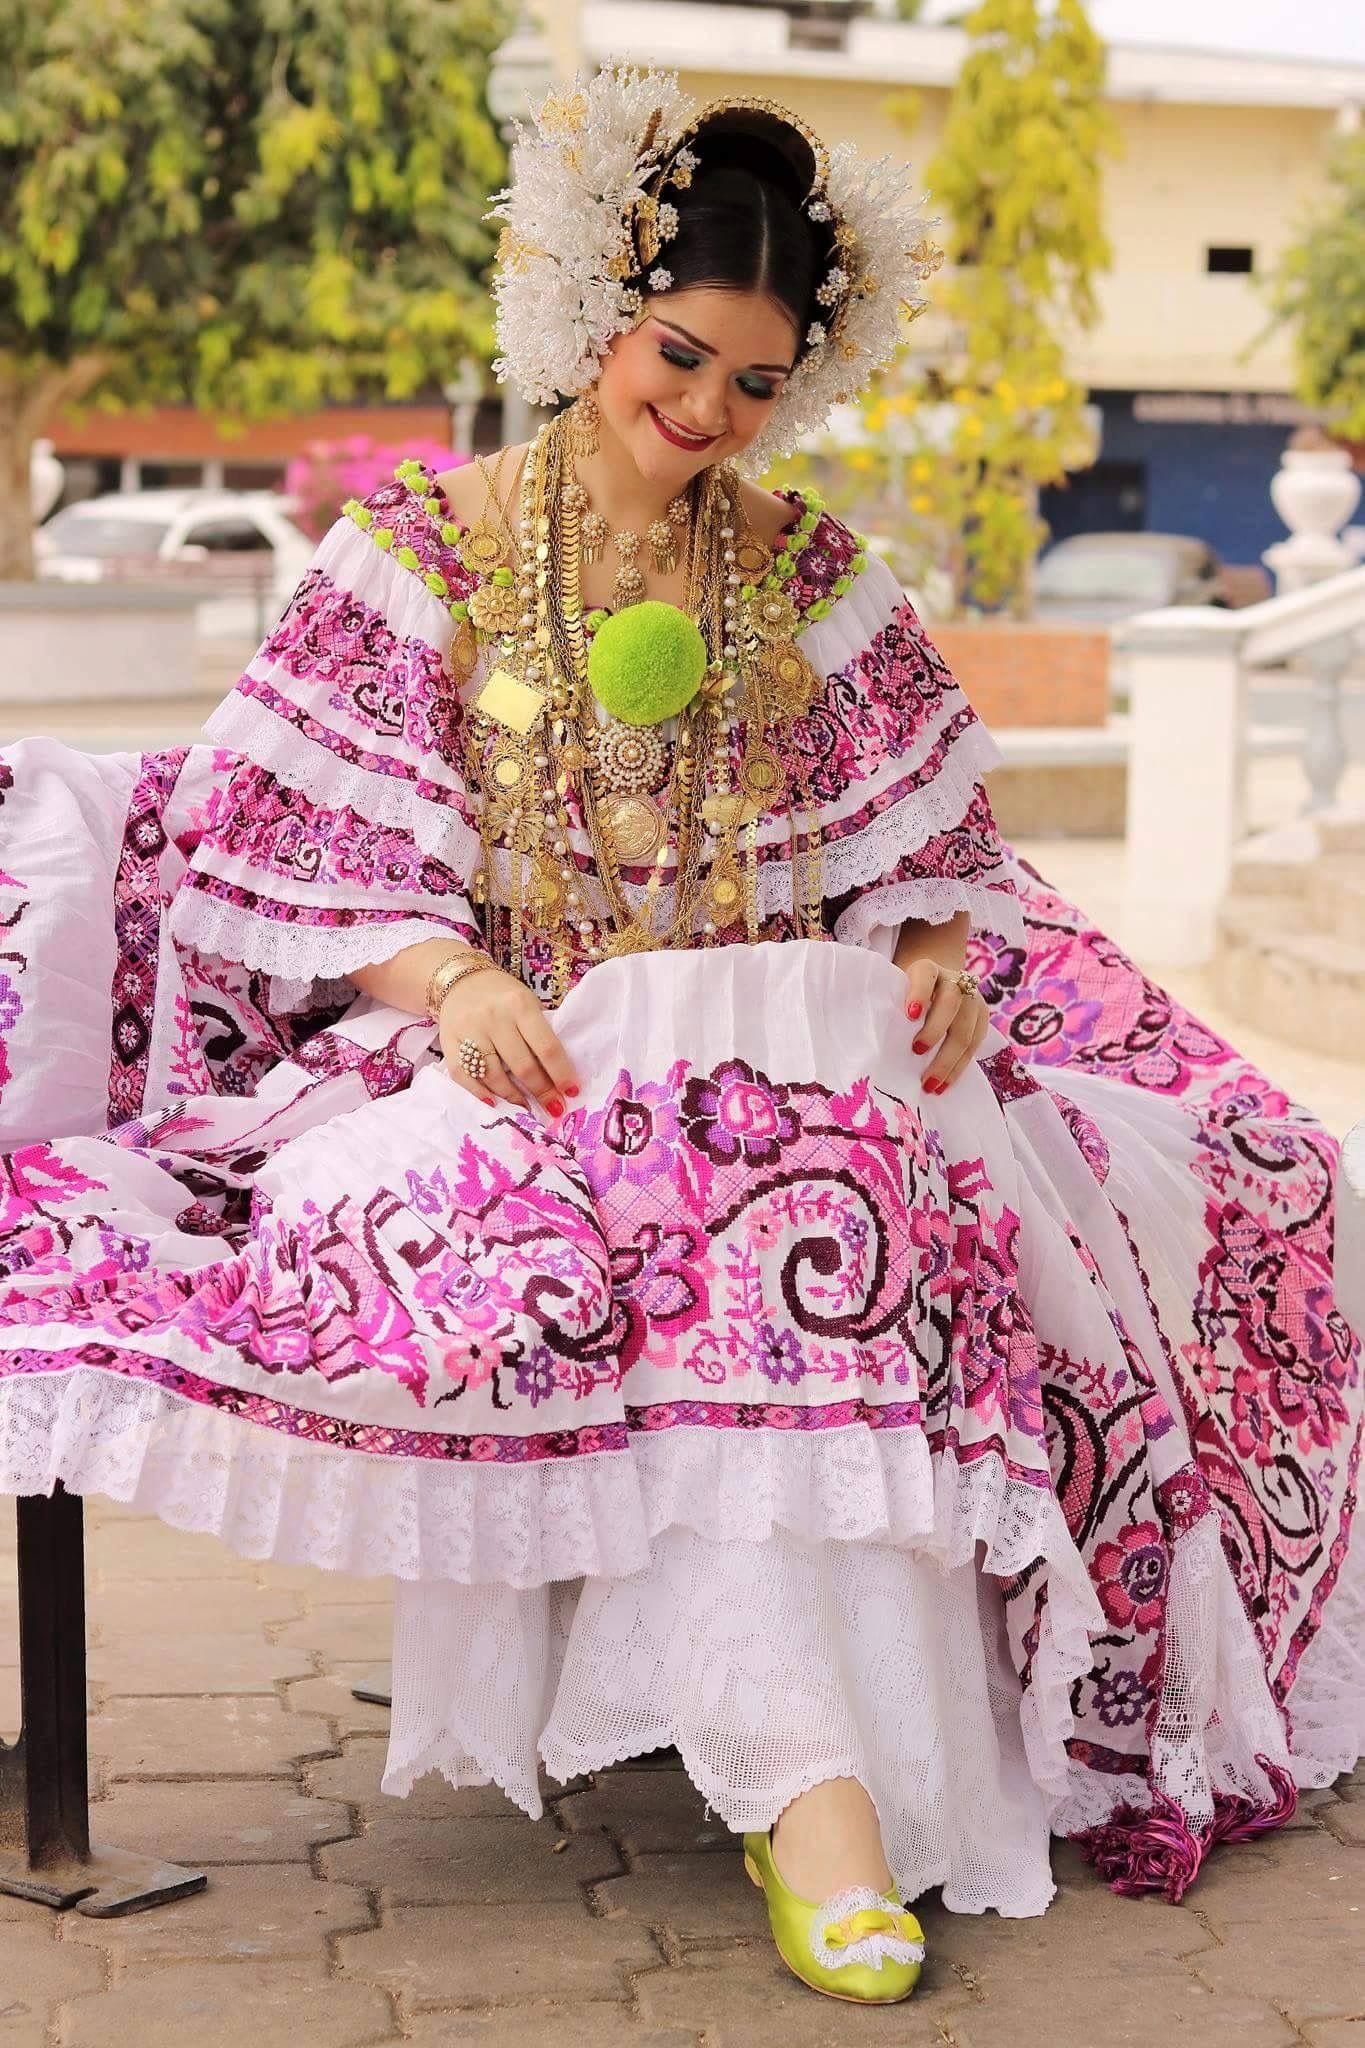 Panamá Polleras | Panama Culture | Folclore